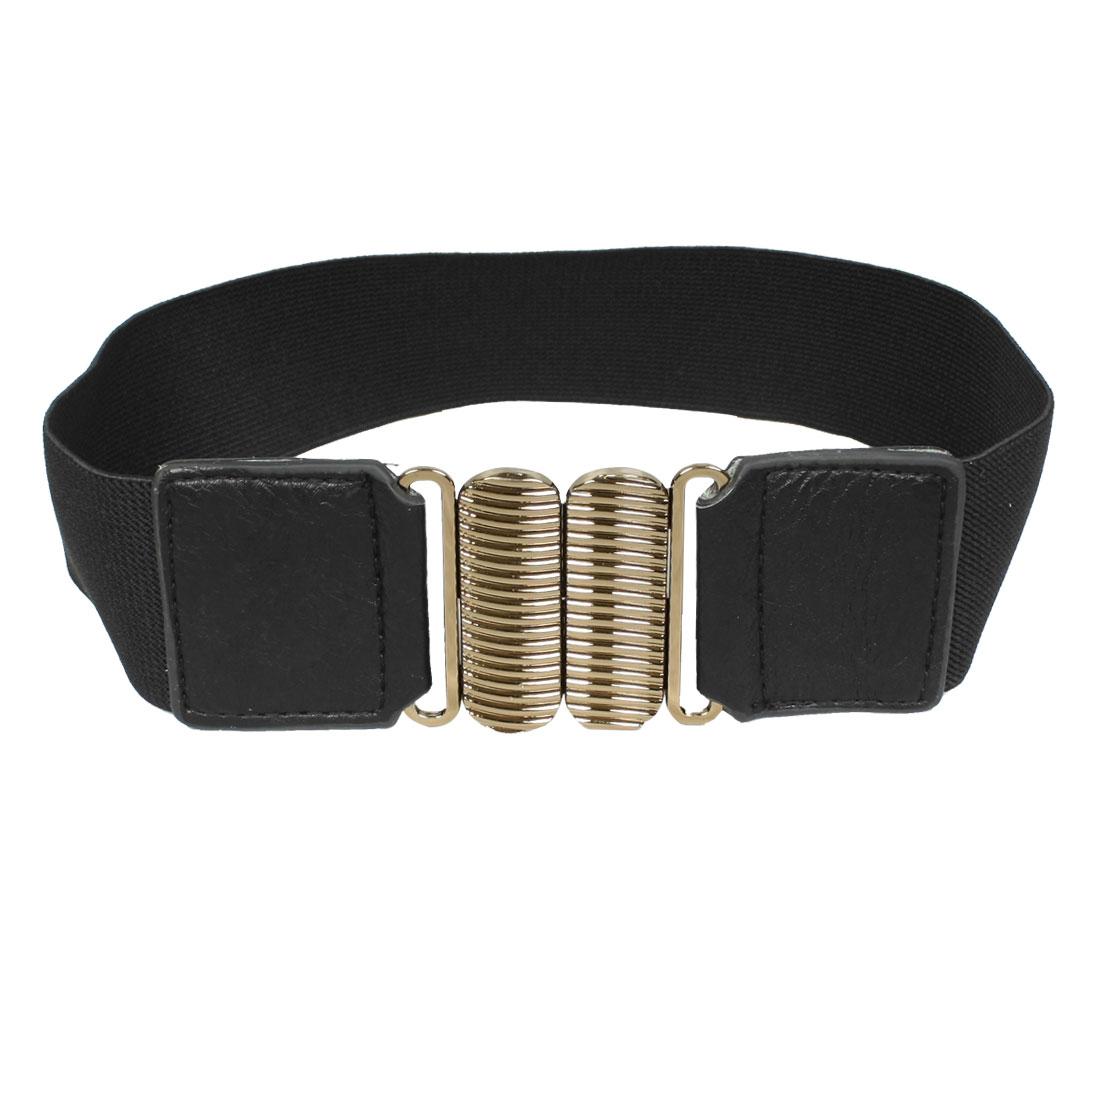 Ladies Metal Interlocking Buckle Waist Belt Corset Band Cinch Black